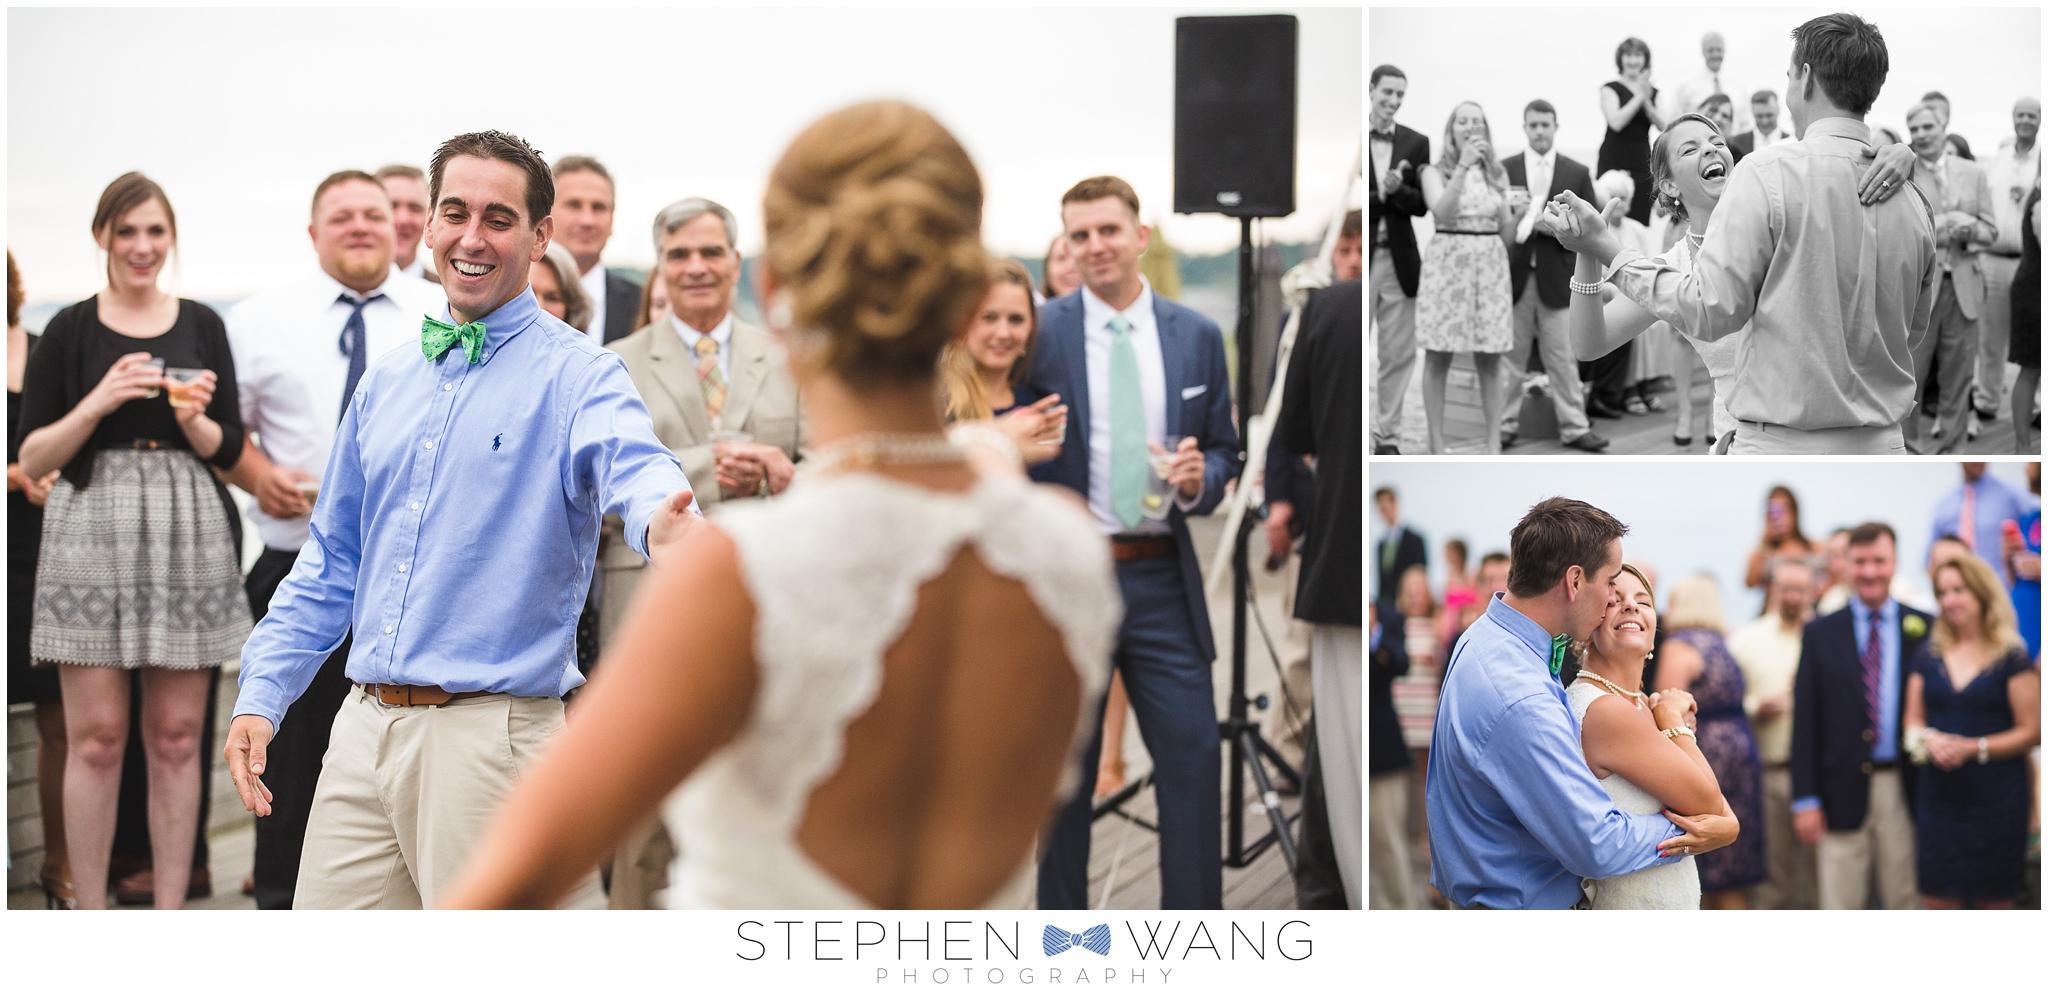 Stephen Wang Photography Madison Surf Club Wedding Photogrpahy CT Connecticut Shoreline Beach Summer Sunset -08-12_0023.jpg